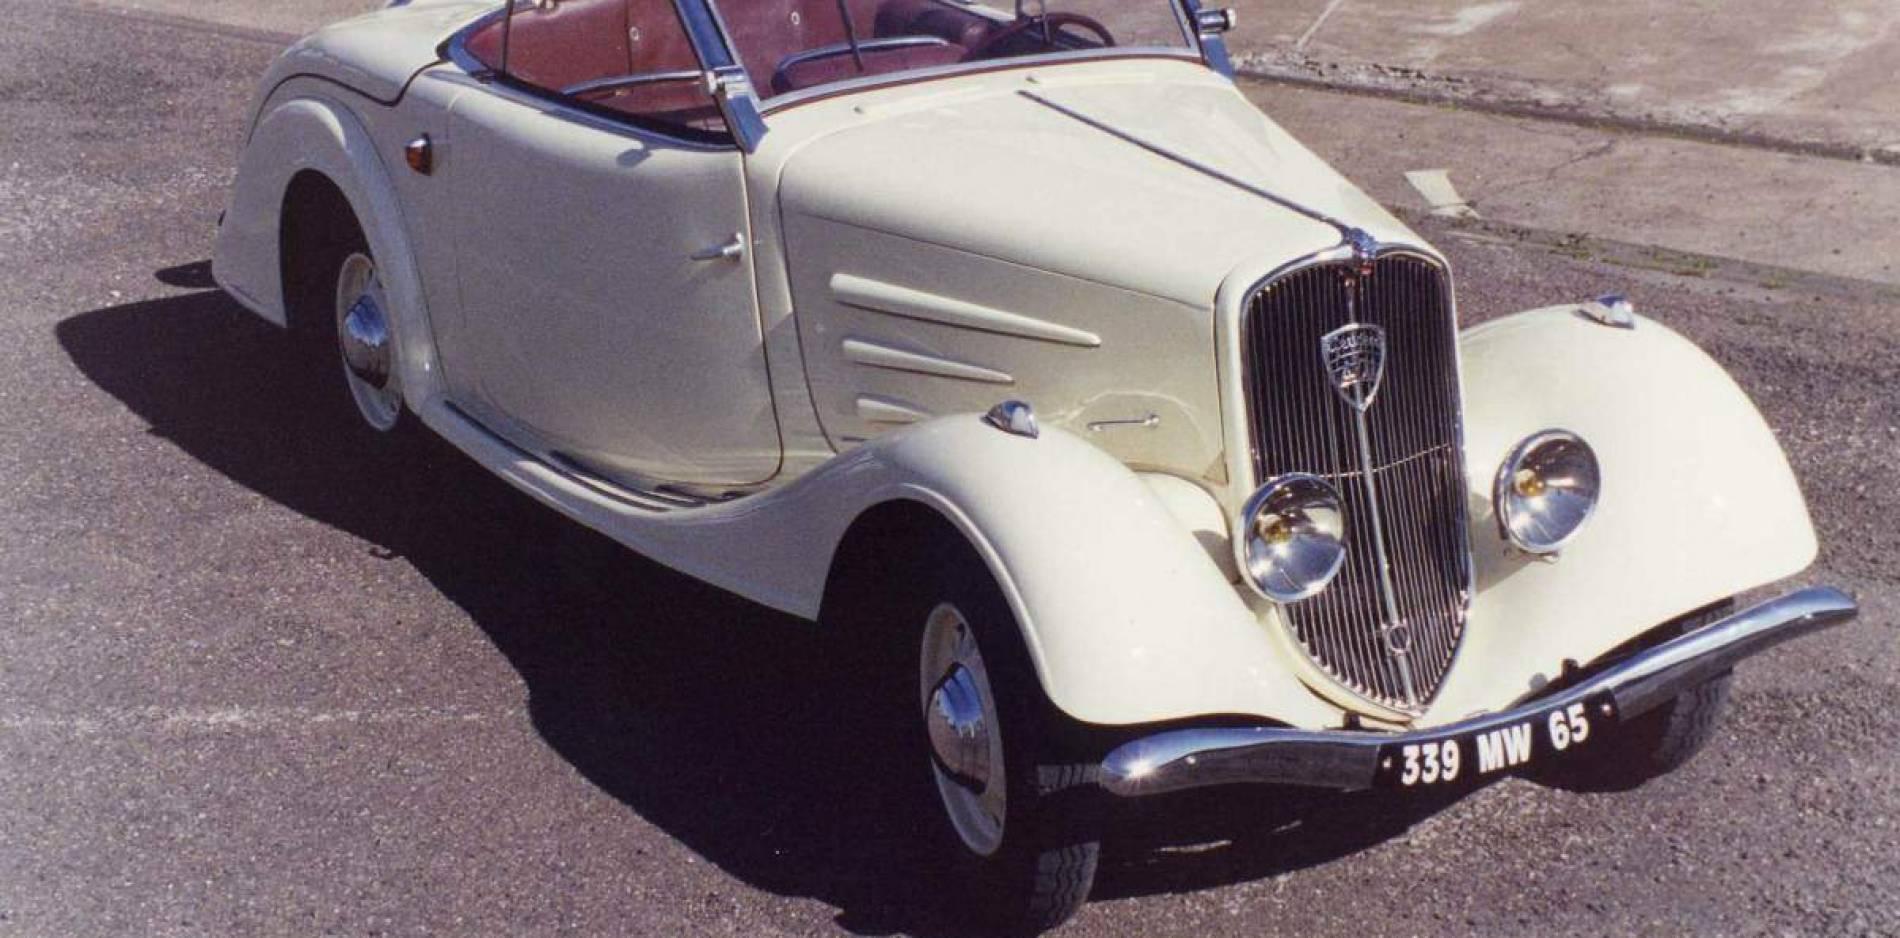 Los Peugeot descapotables más famosos de la historia